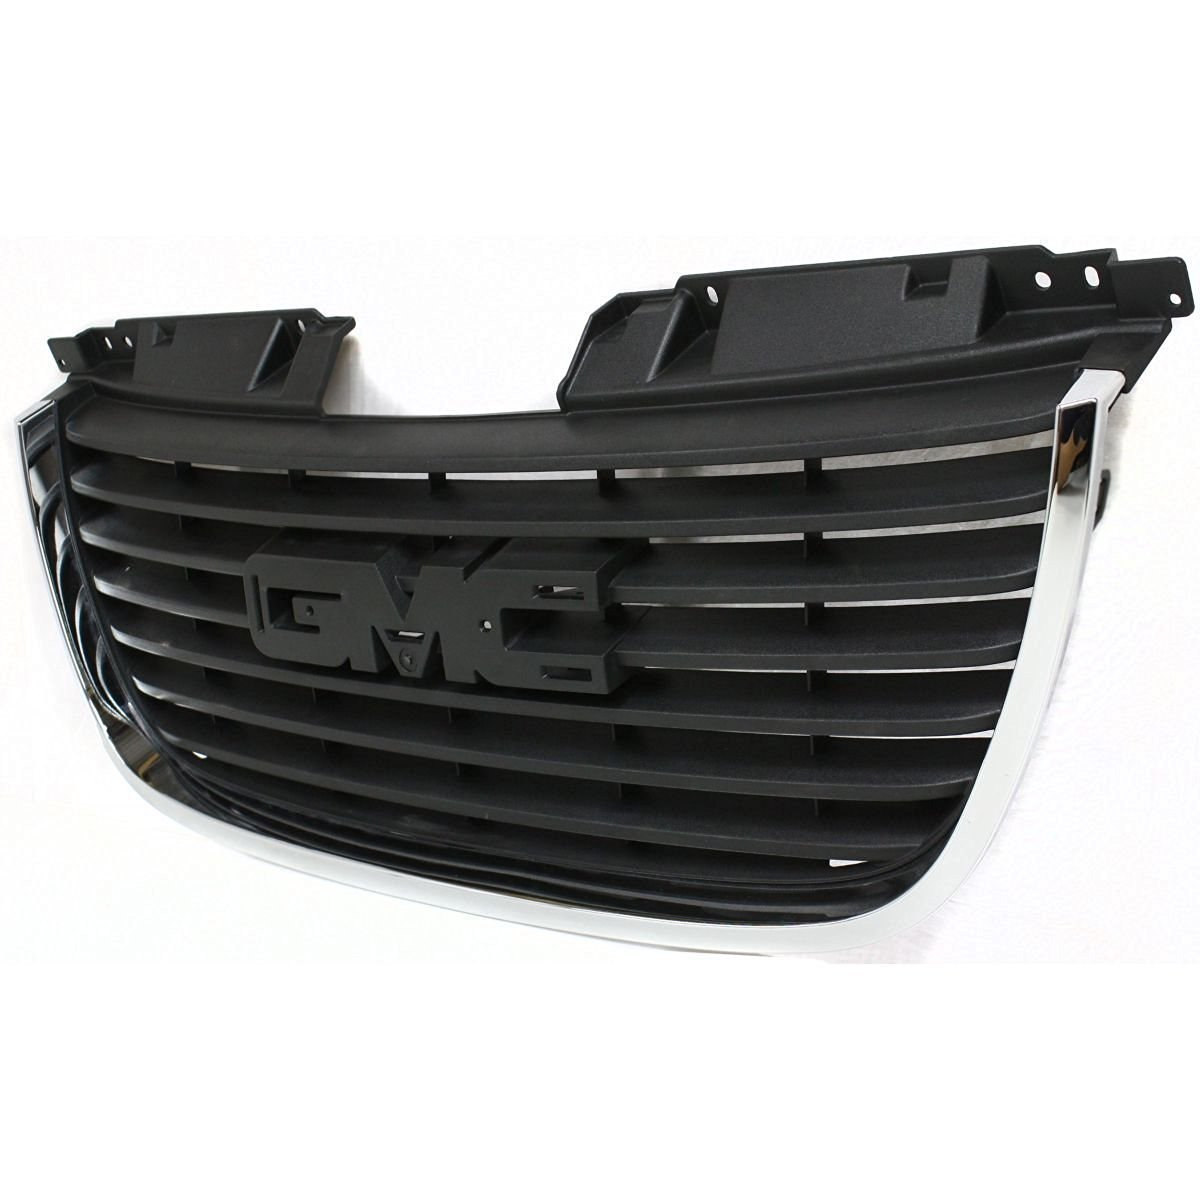 Diften 102-A1927-X01 - New Grille Assembly Grill Chrome shell black insert GMC Yukon GM1200576 25891151